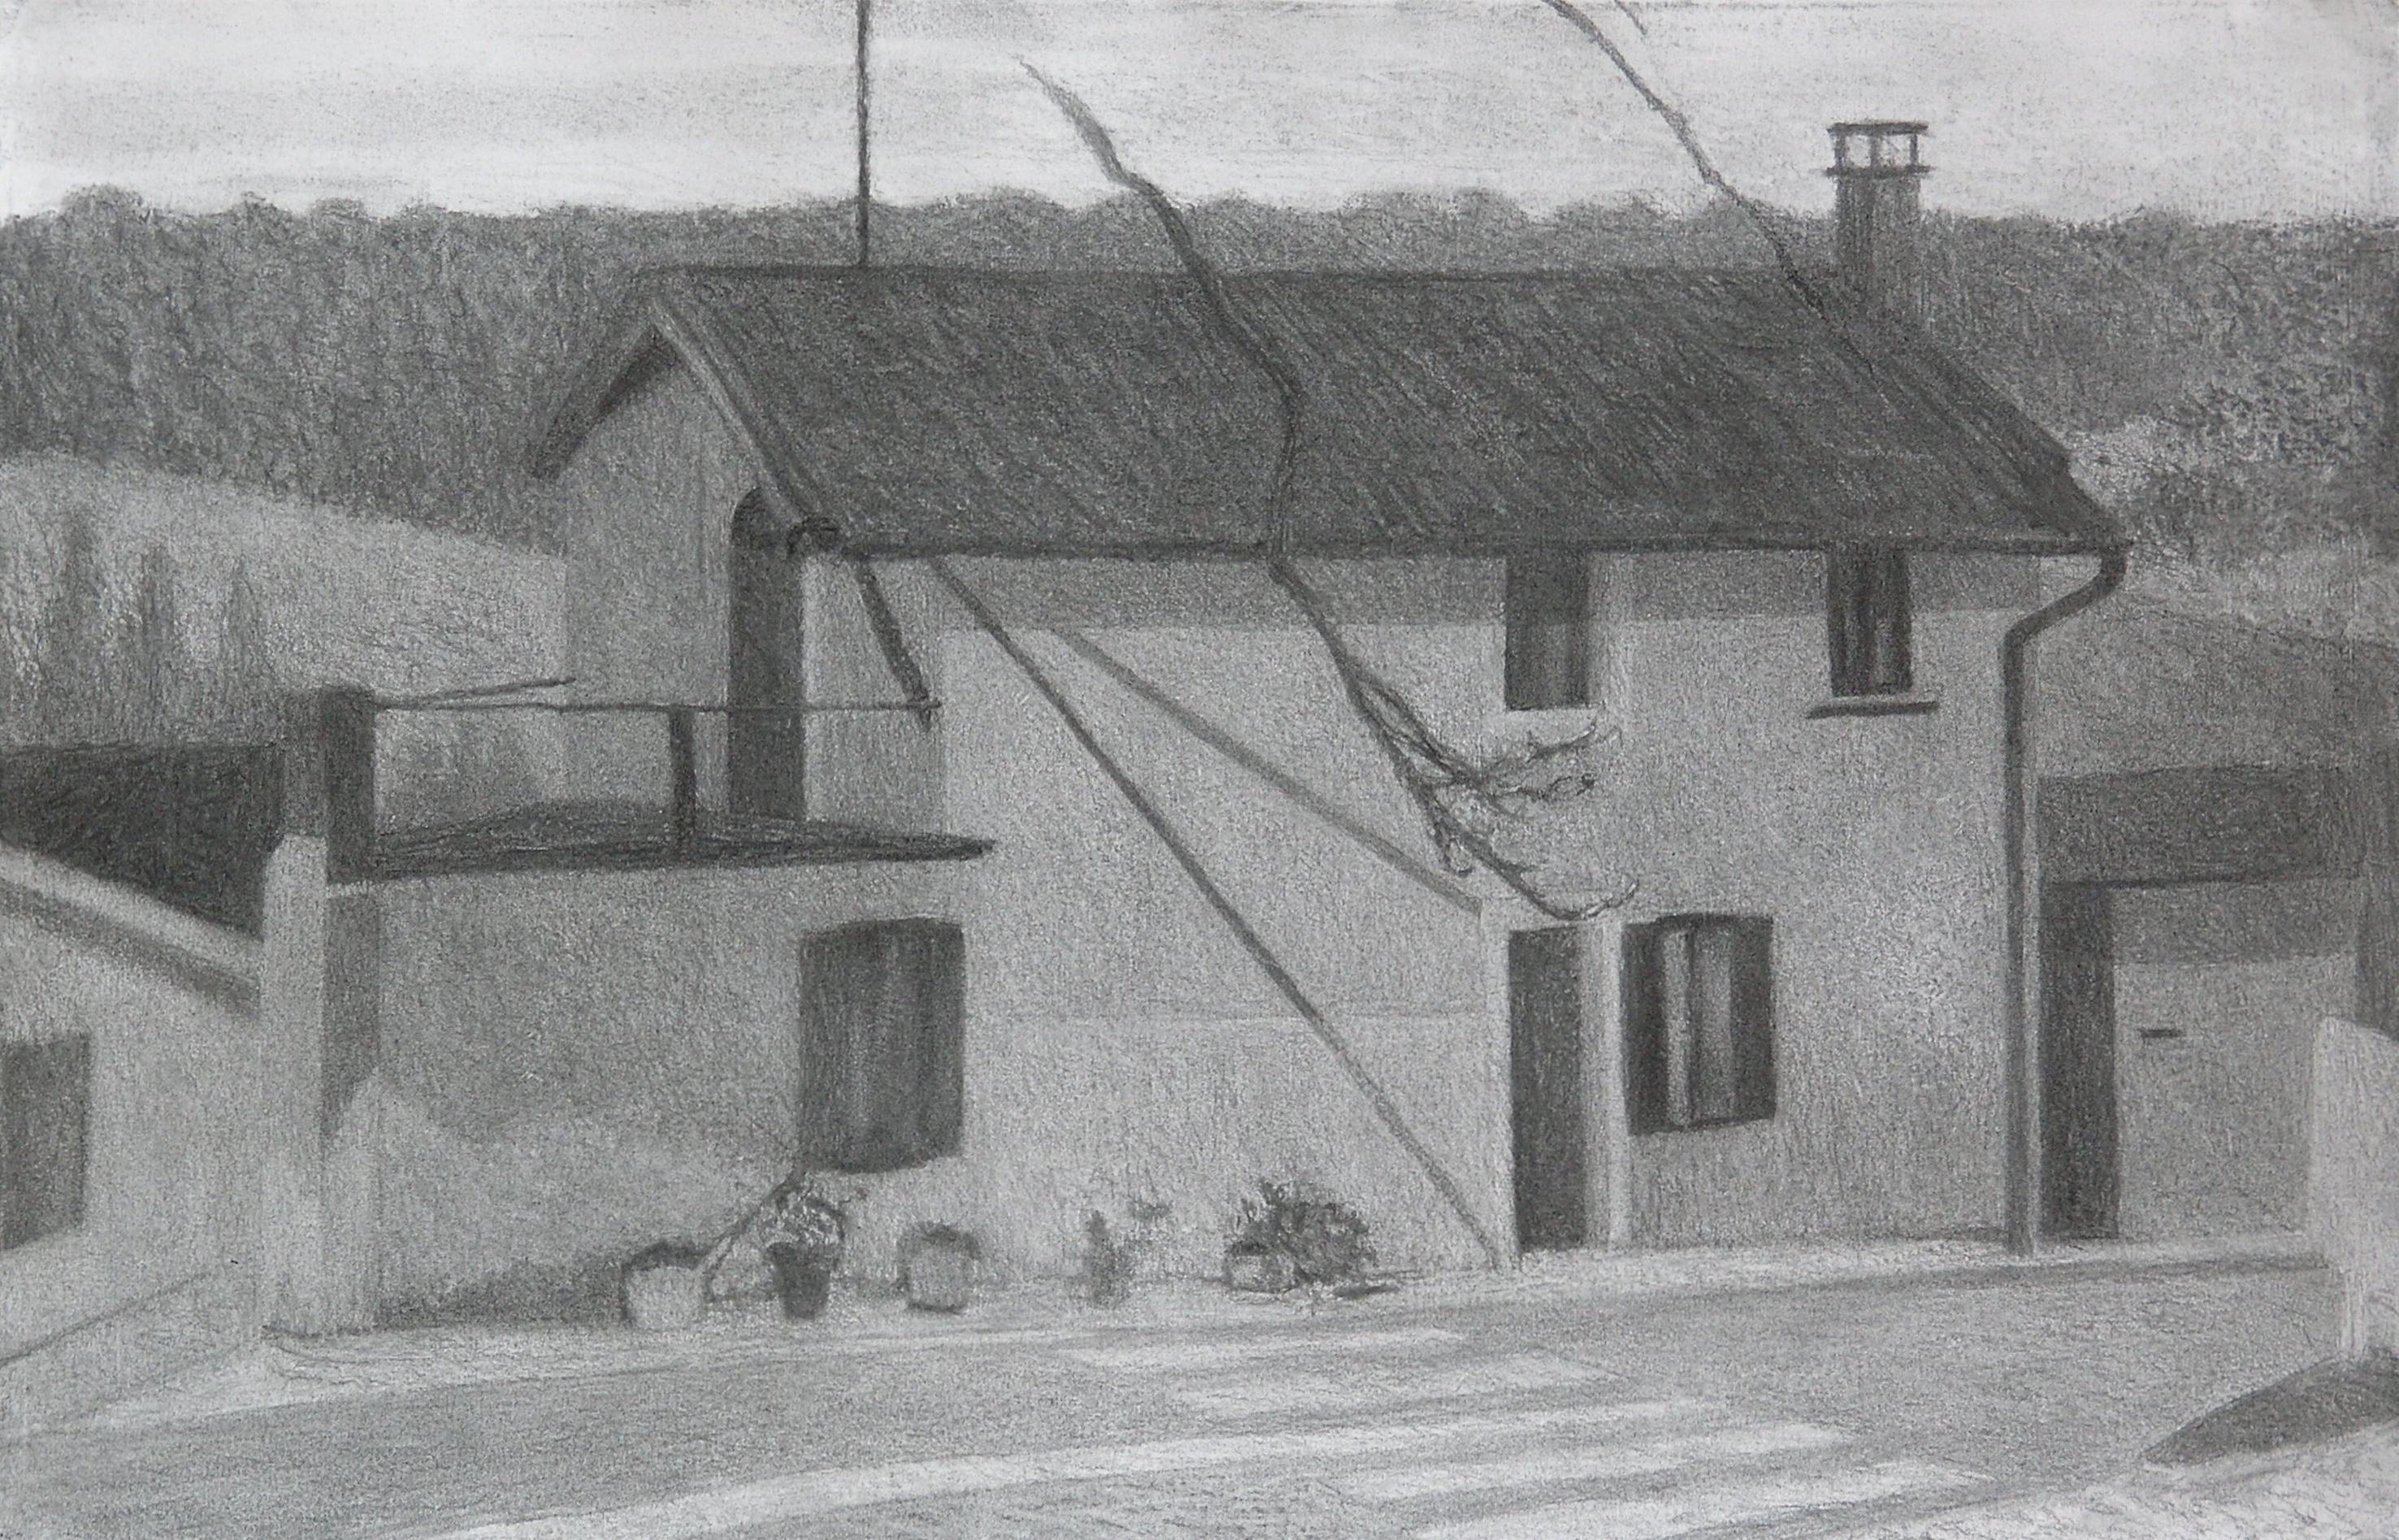 Postman's house 2